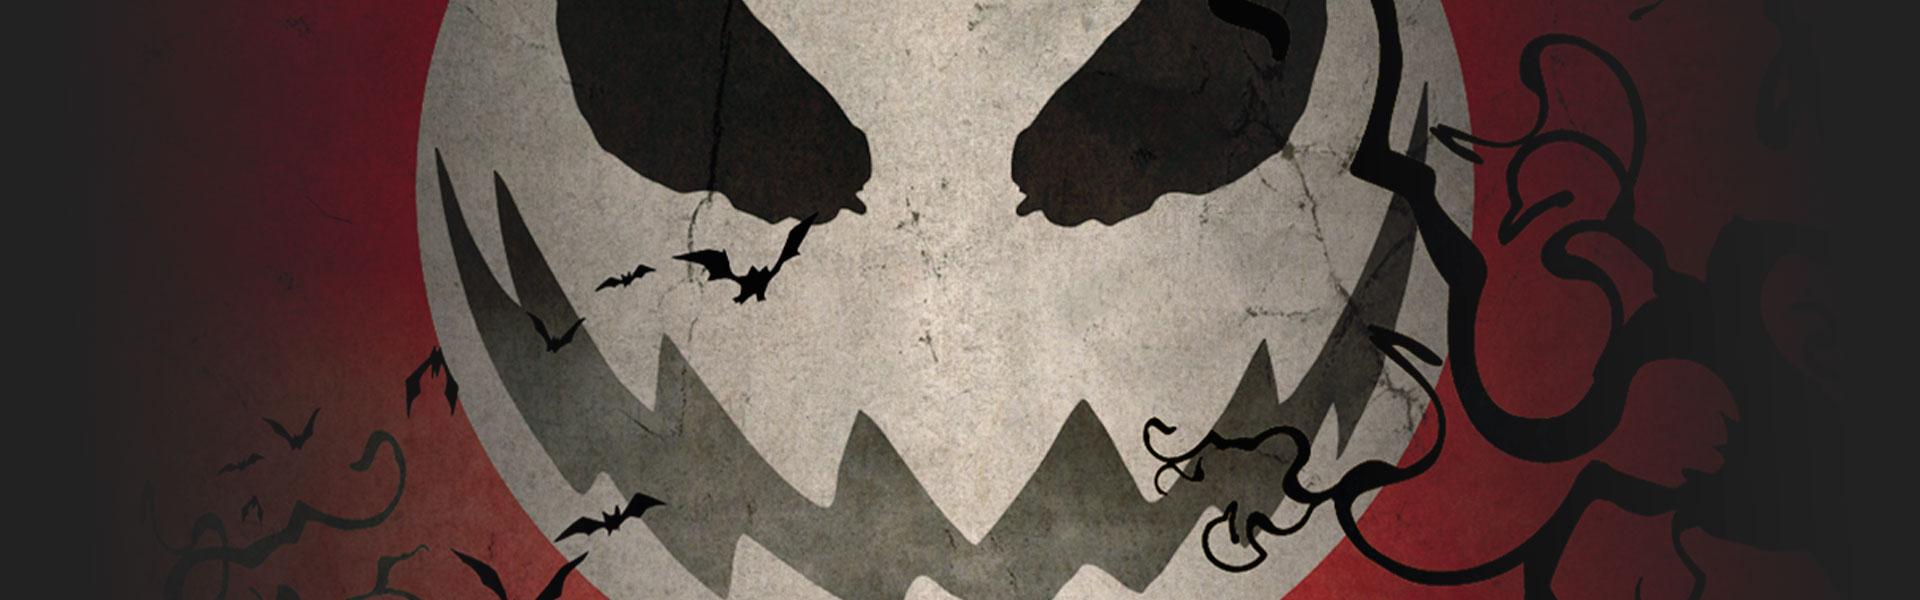 http://www.fuelrecords.it/public/wp-content/uploads/2014/03/sfondo-halloween.jpg